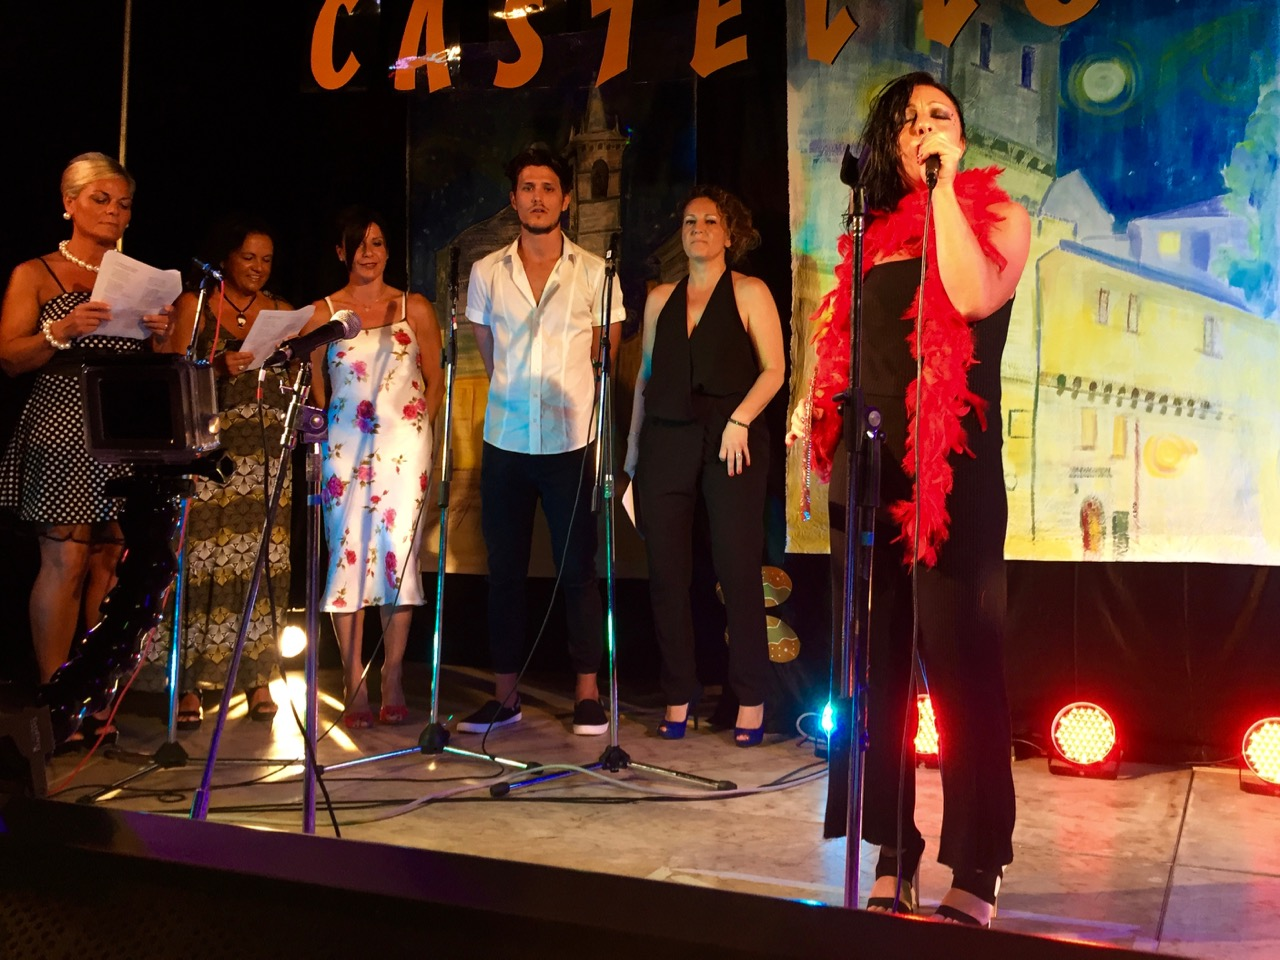 16-07-23 CASTELLO D'ORO 2016 - 50.jpg